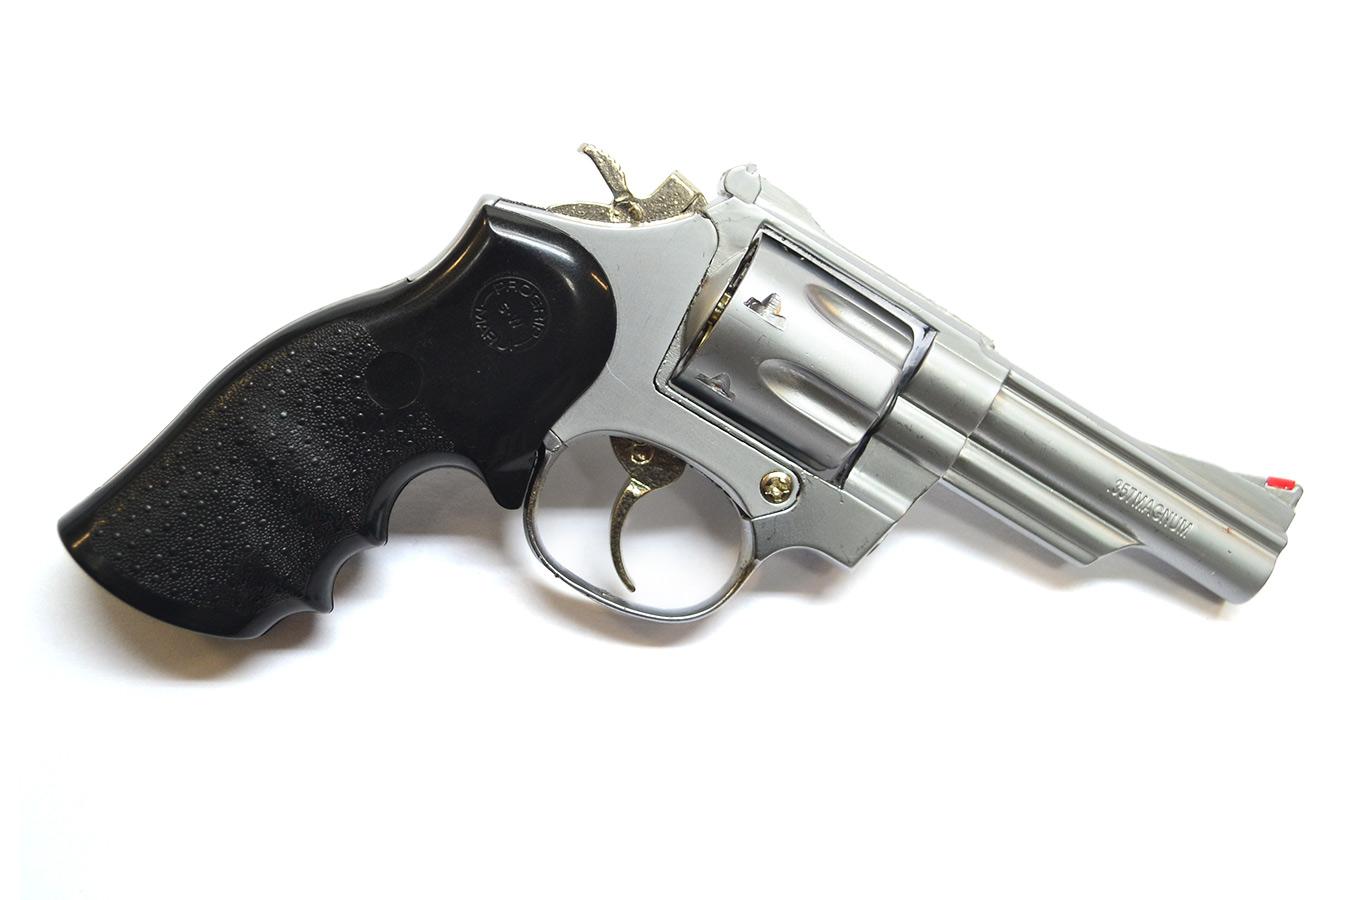 Smith & Wesson Model 29 изображение 4